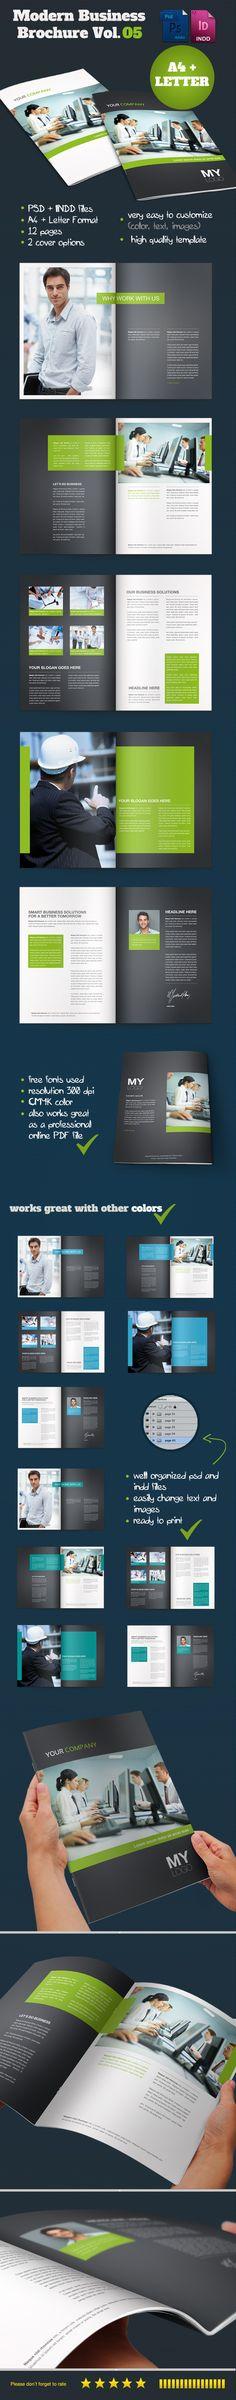 267 best Work Digital Exchange images on Pinterest Art - sample business brochure